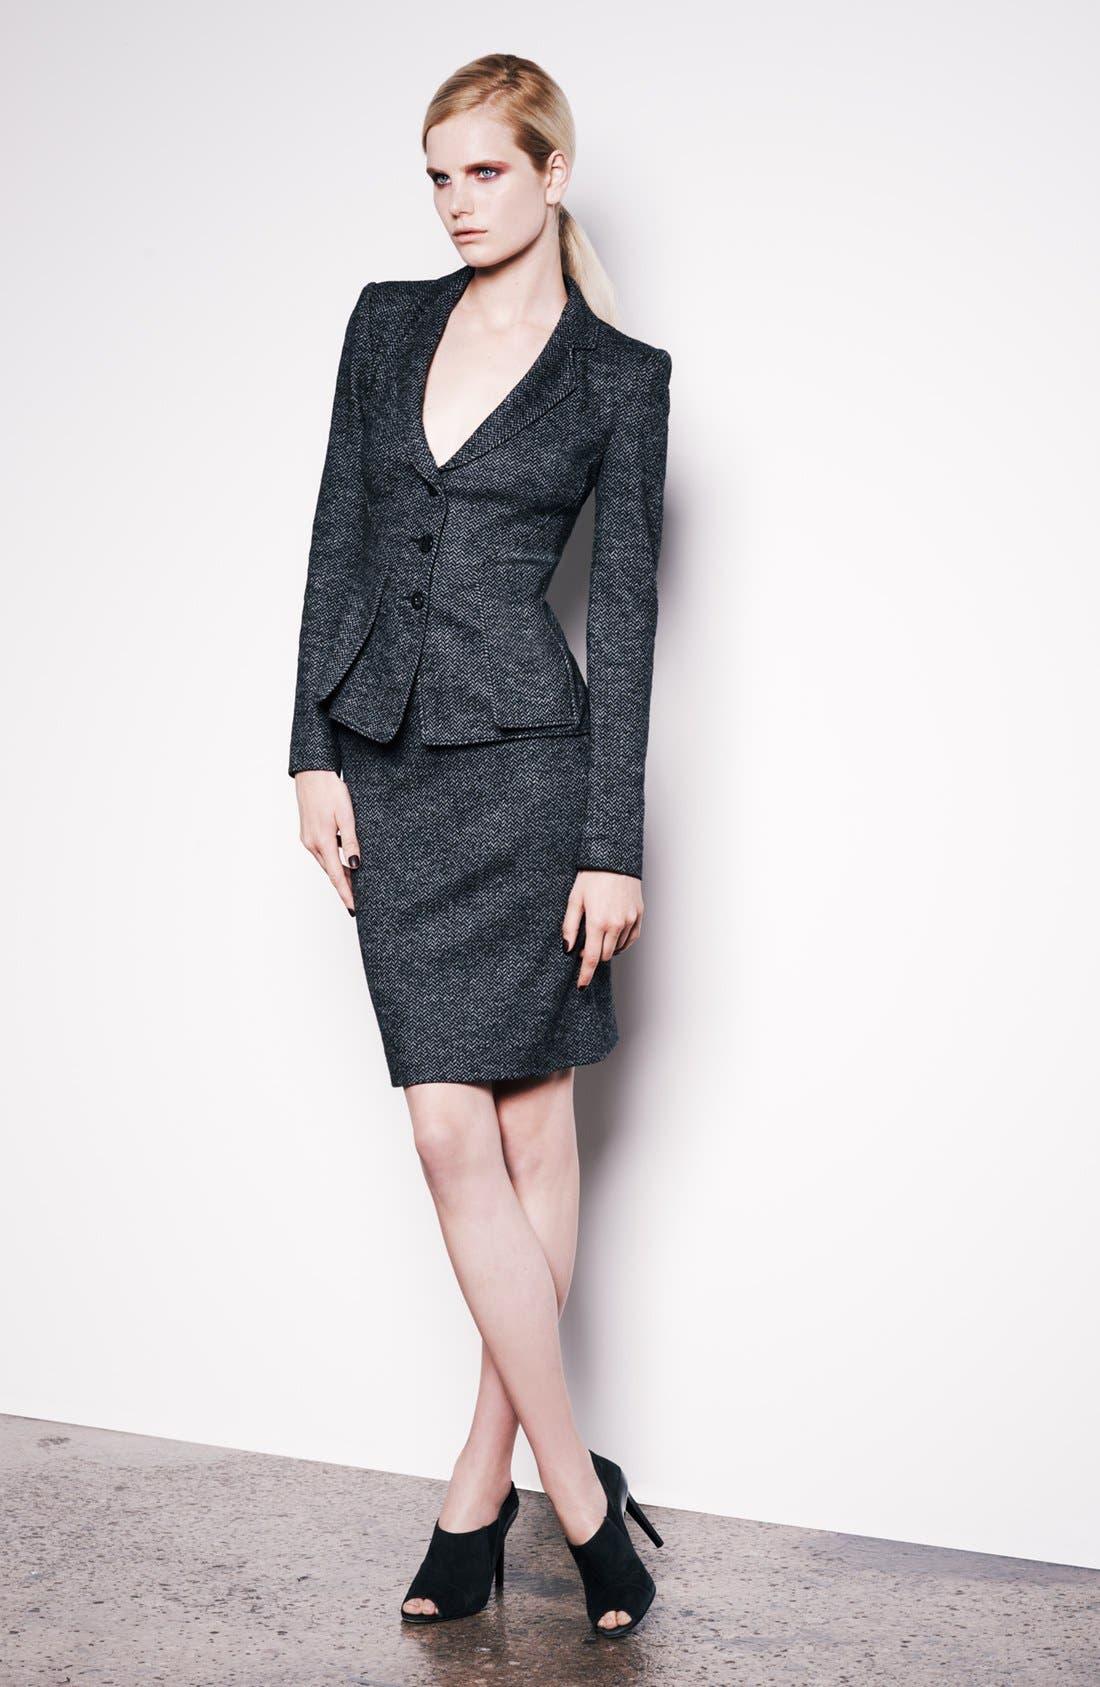 Main Image - Armani Collezioni Jacket, Blouse & Skirt